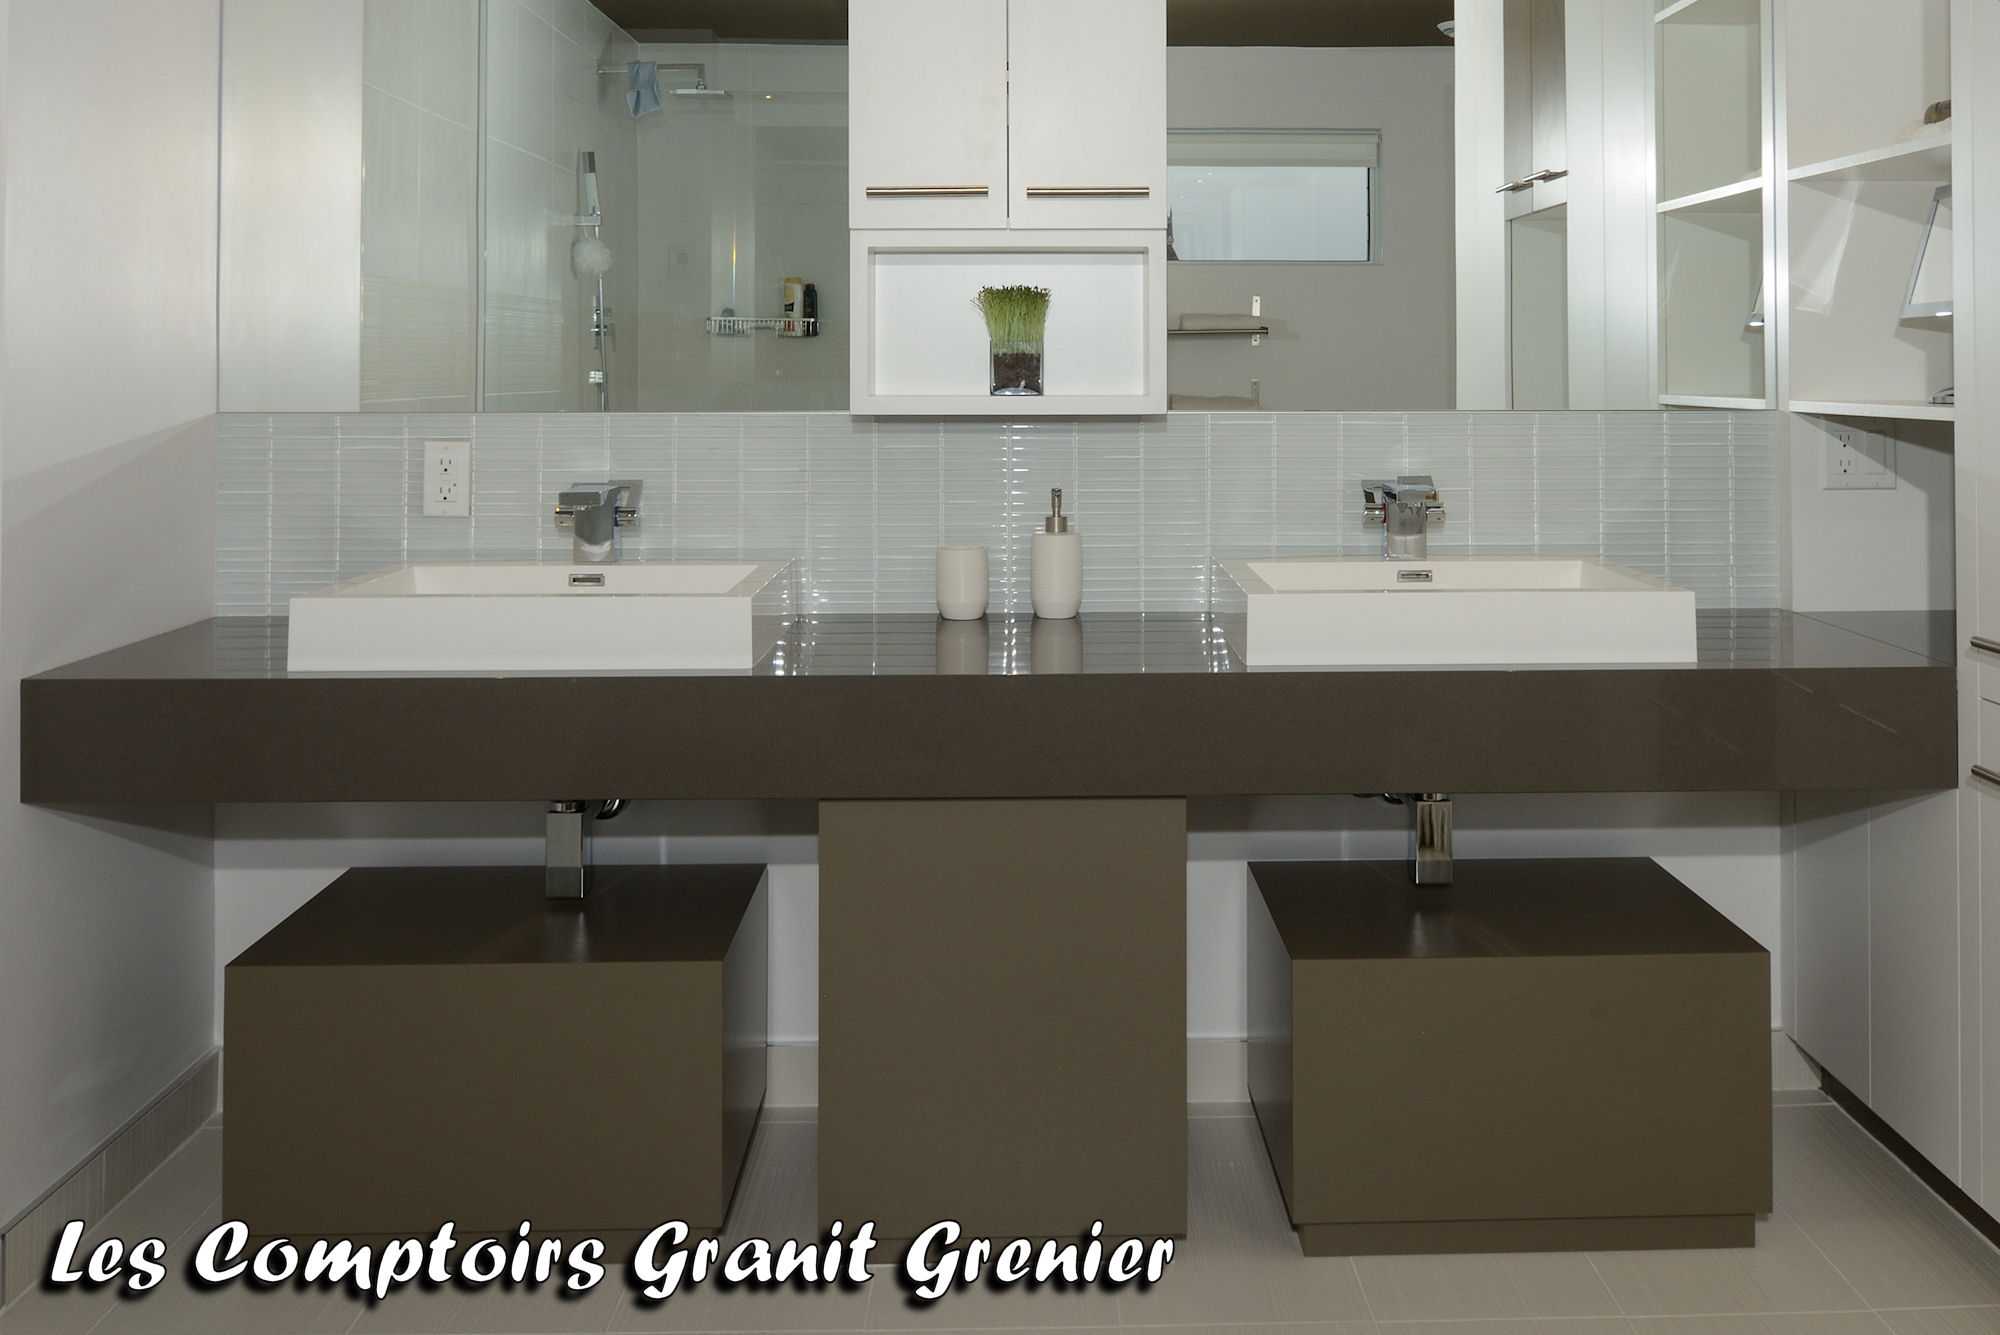 Comptoir de granit et quartz comptoirs de salle de bain for Comptoir de salle de bain